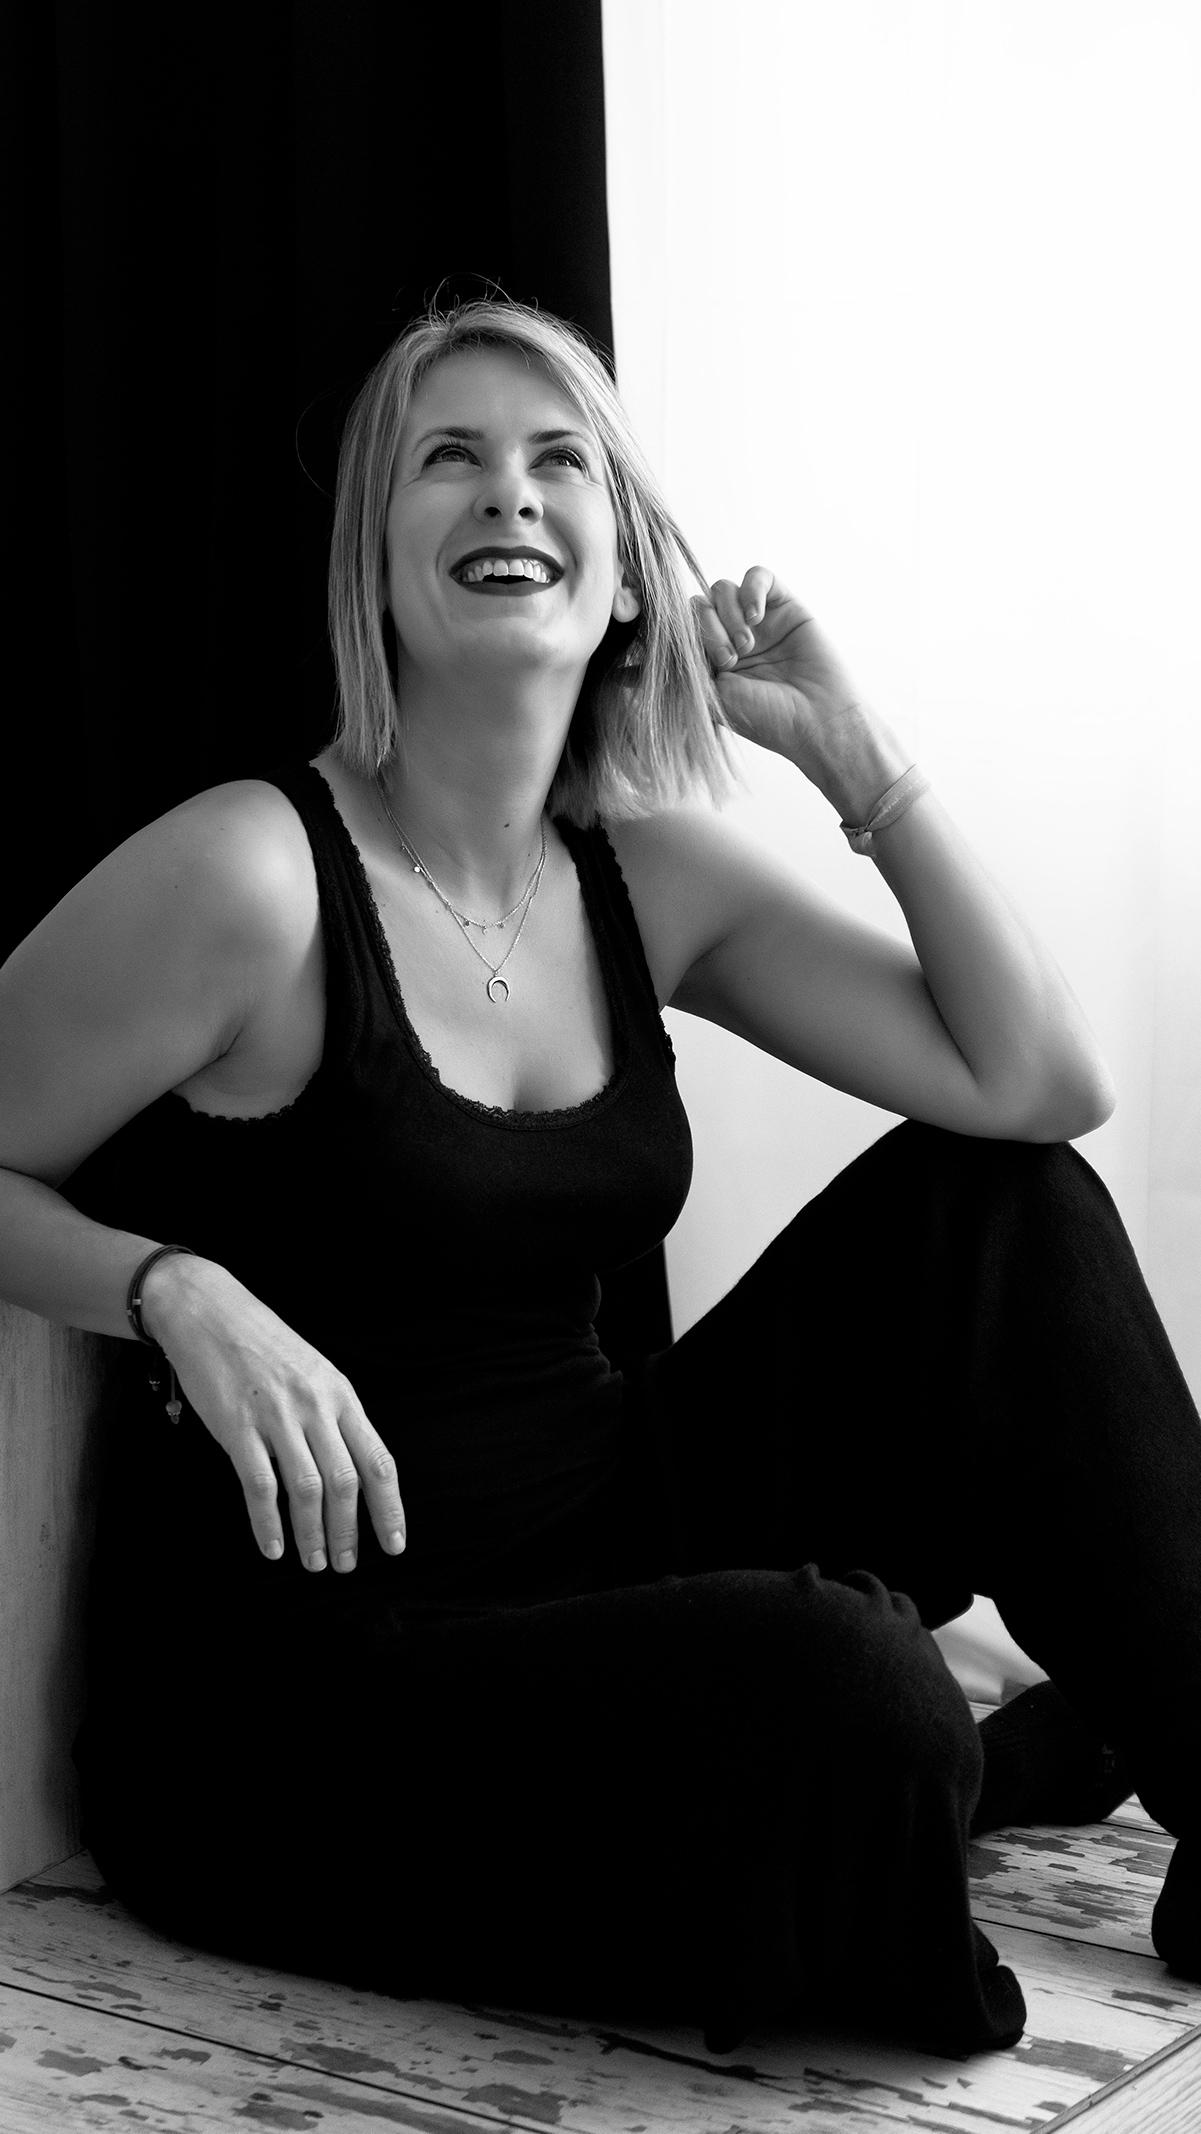 Book profesional - Book y Retrato - Leidy Cano, Fotografía Profesional